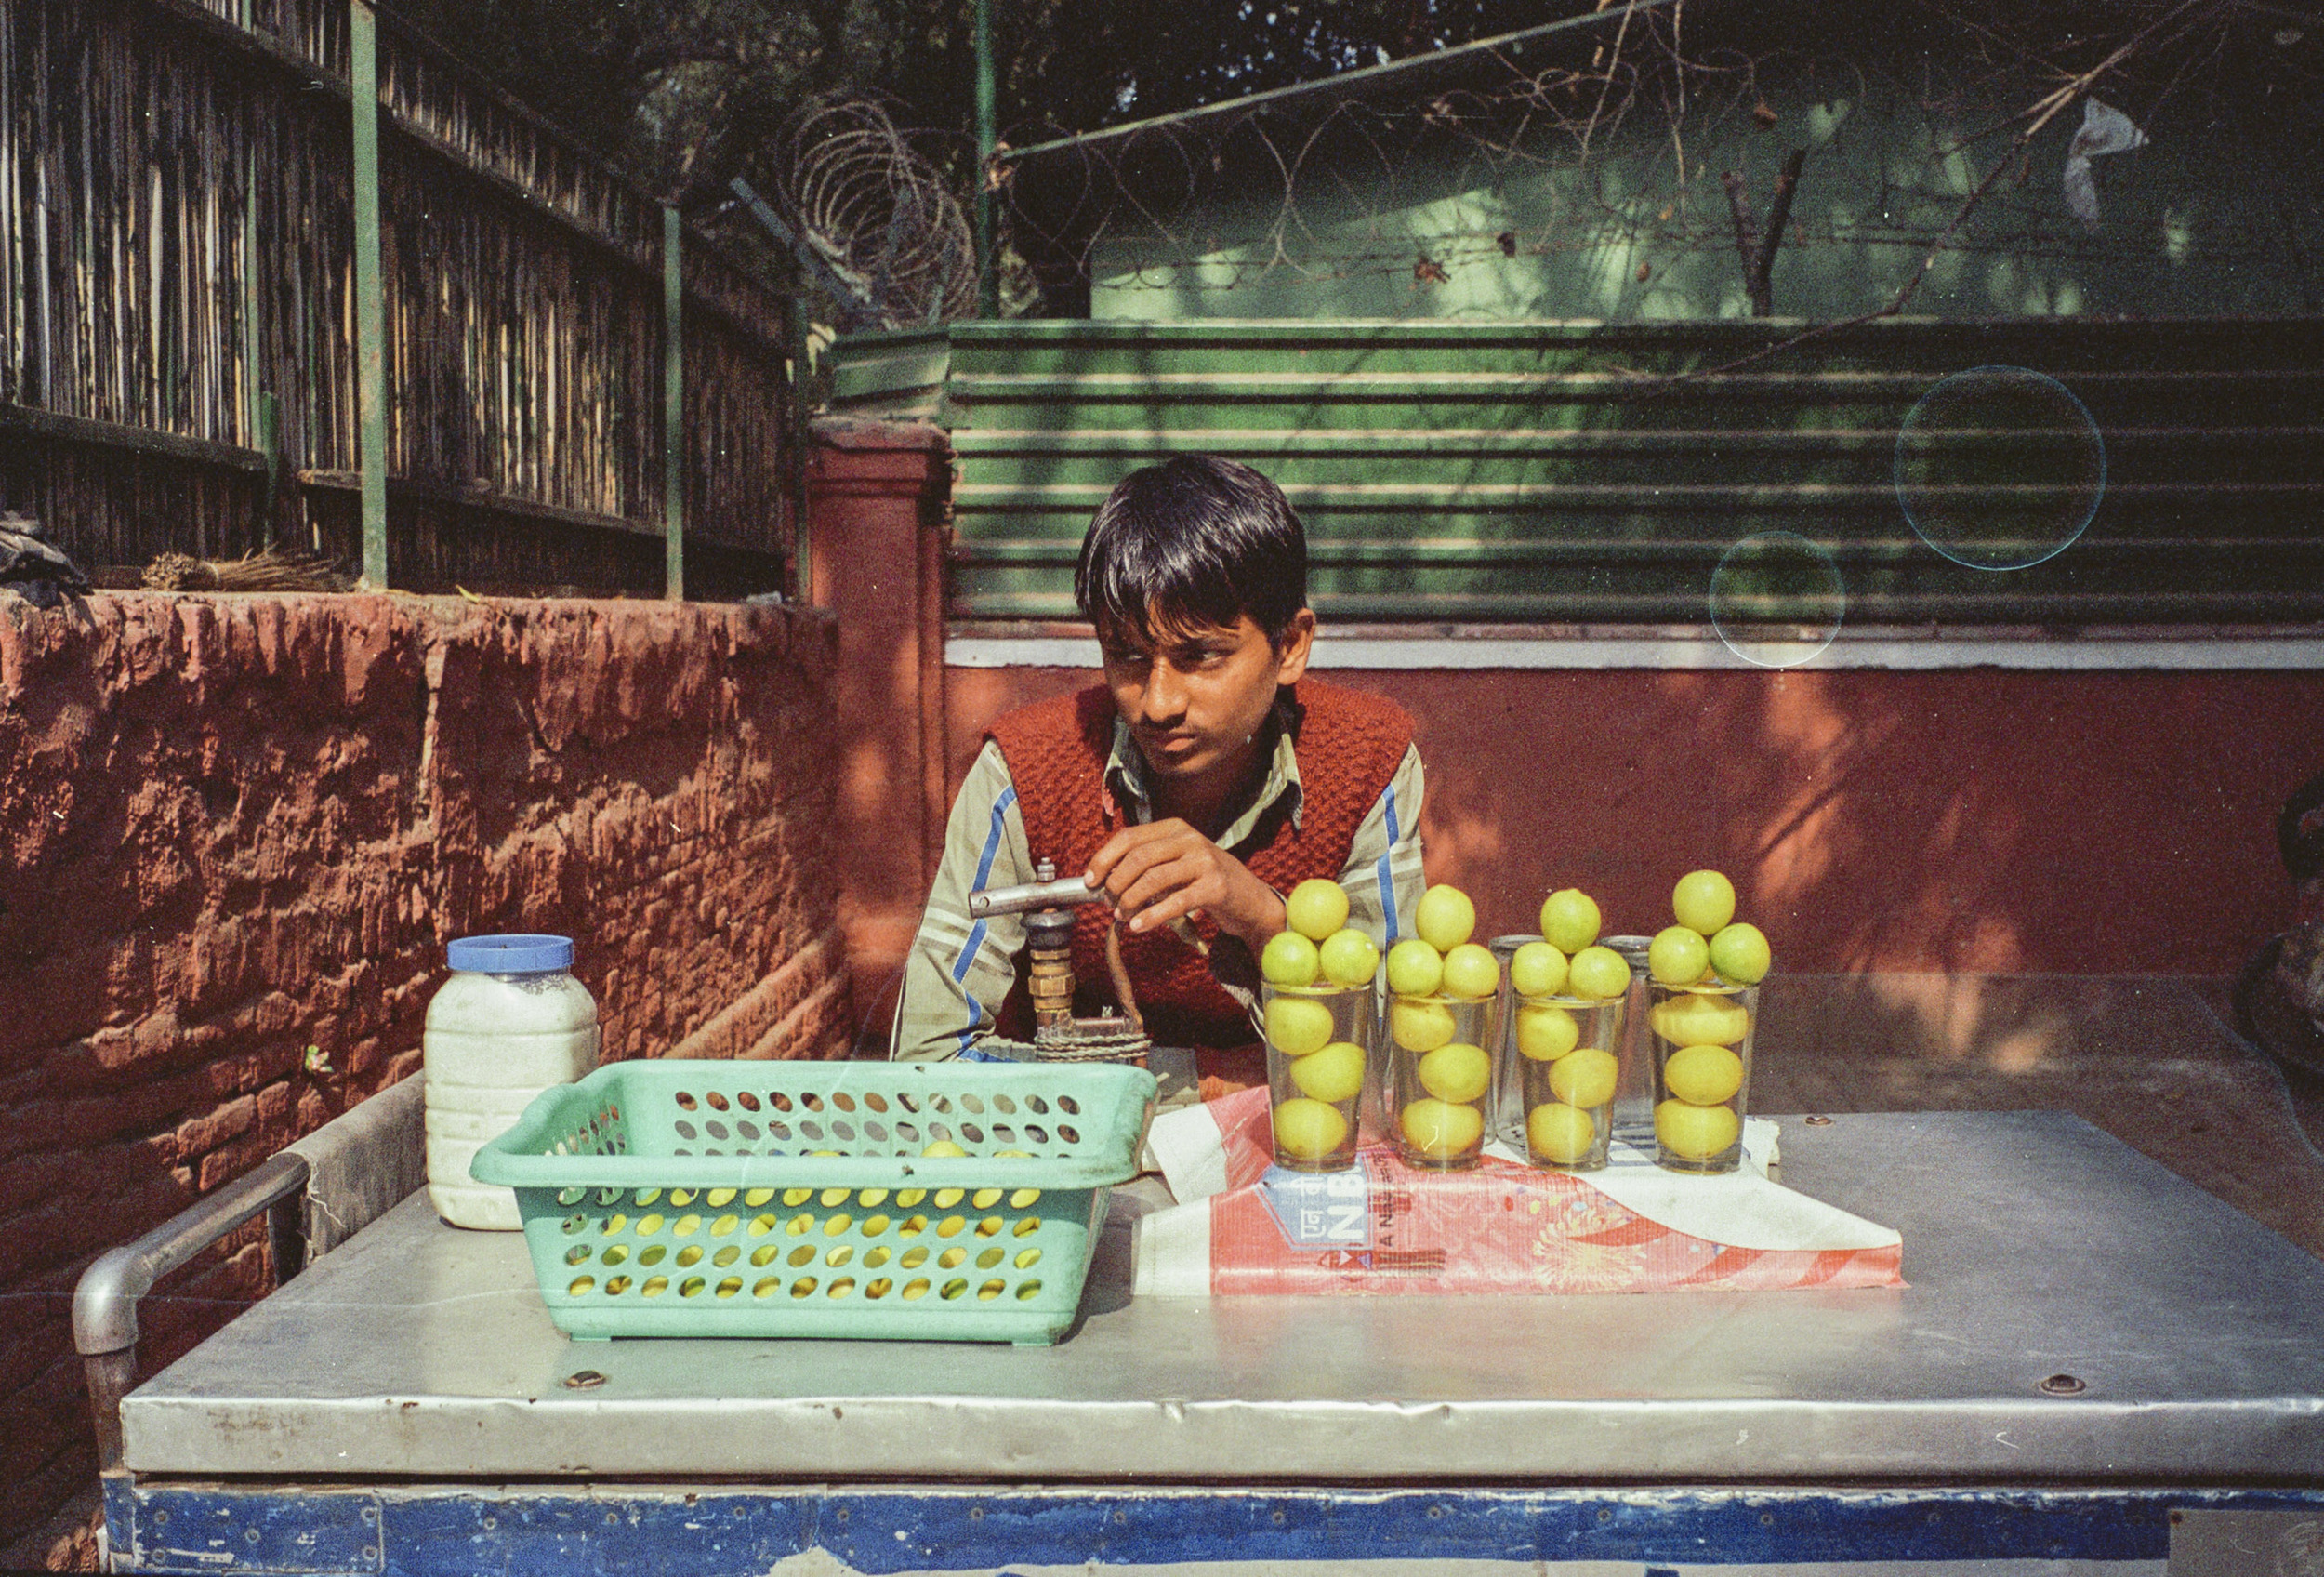 69-F17_Lemon Juice Vender, Delhi, India 2016-67.jpg